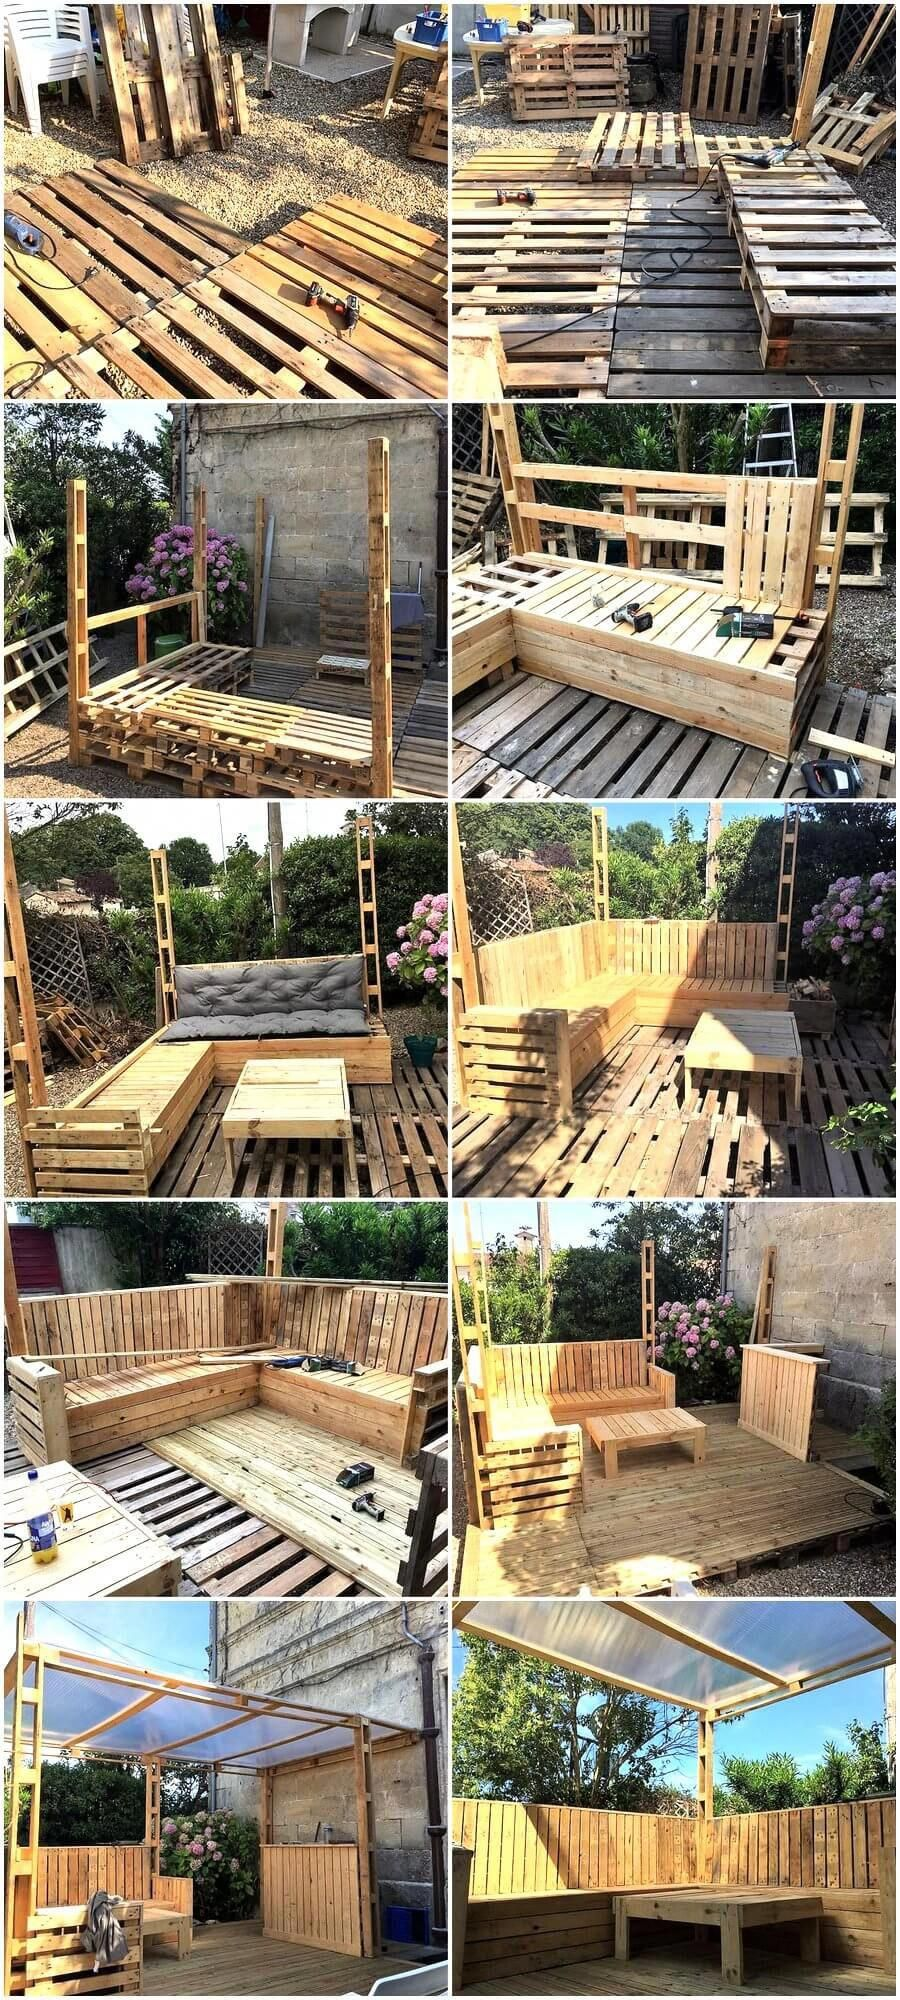 Diy Wood Pallets Patio Gazebo Deck With Furniture Plan Patio